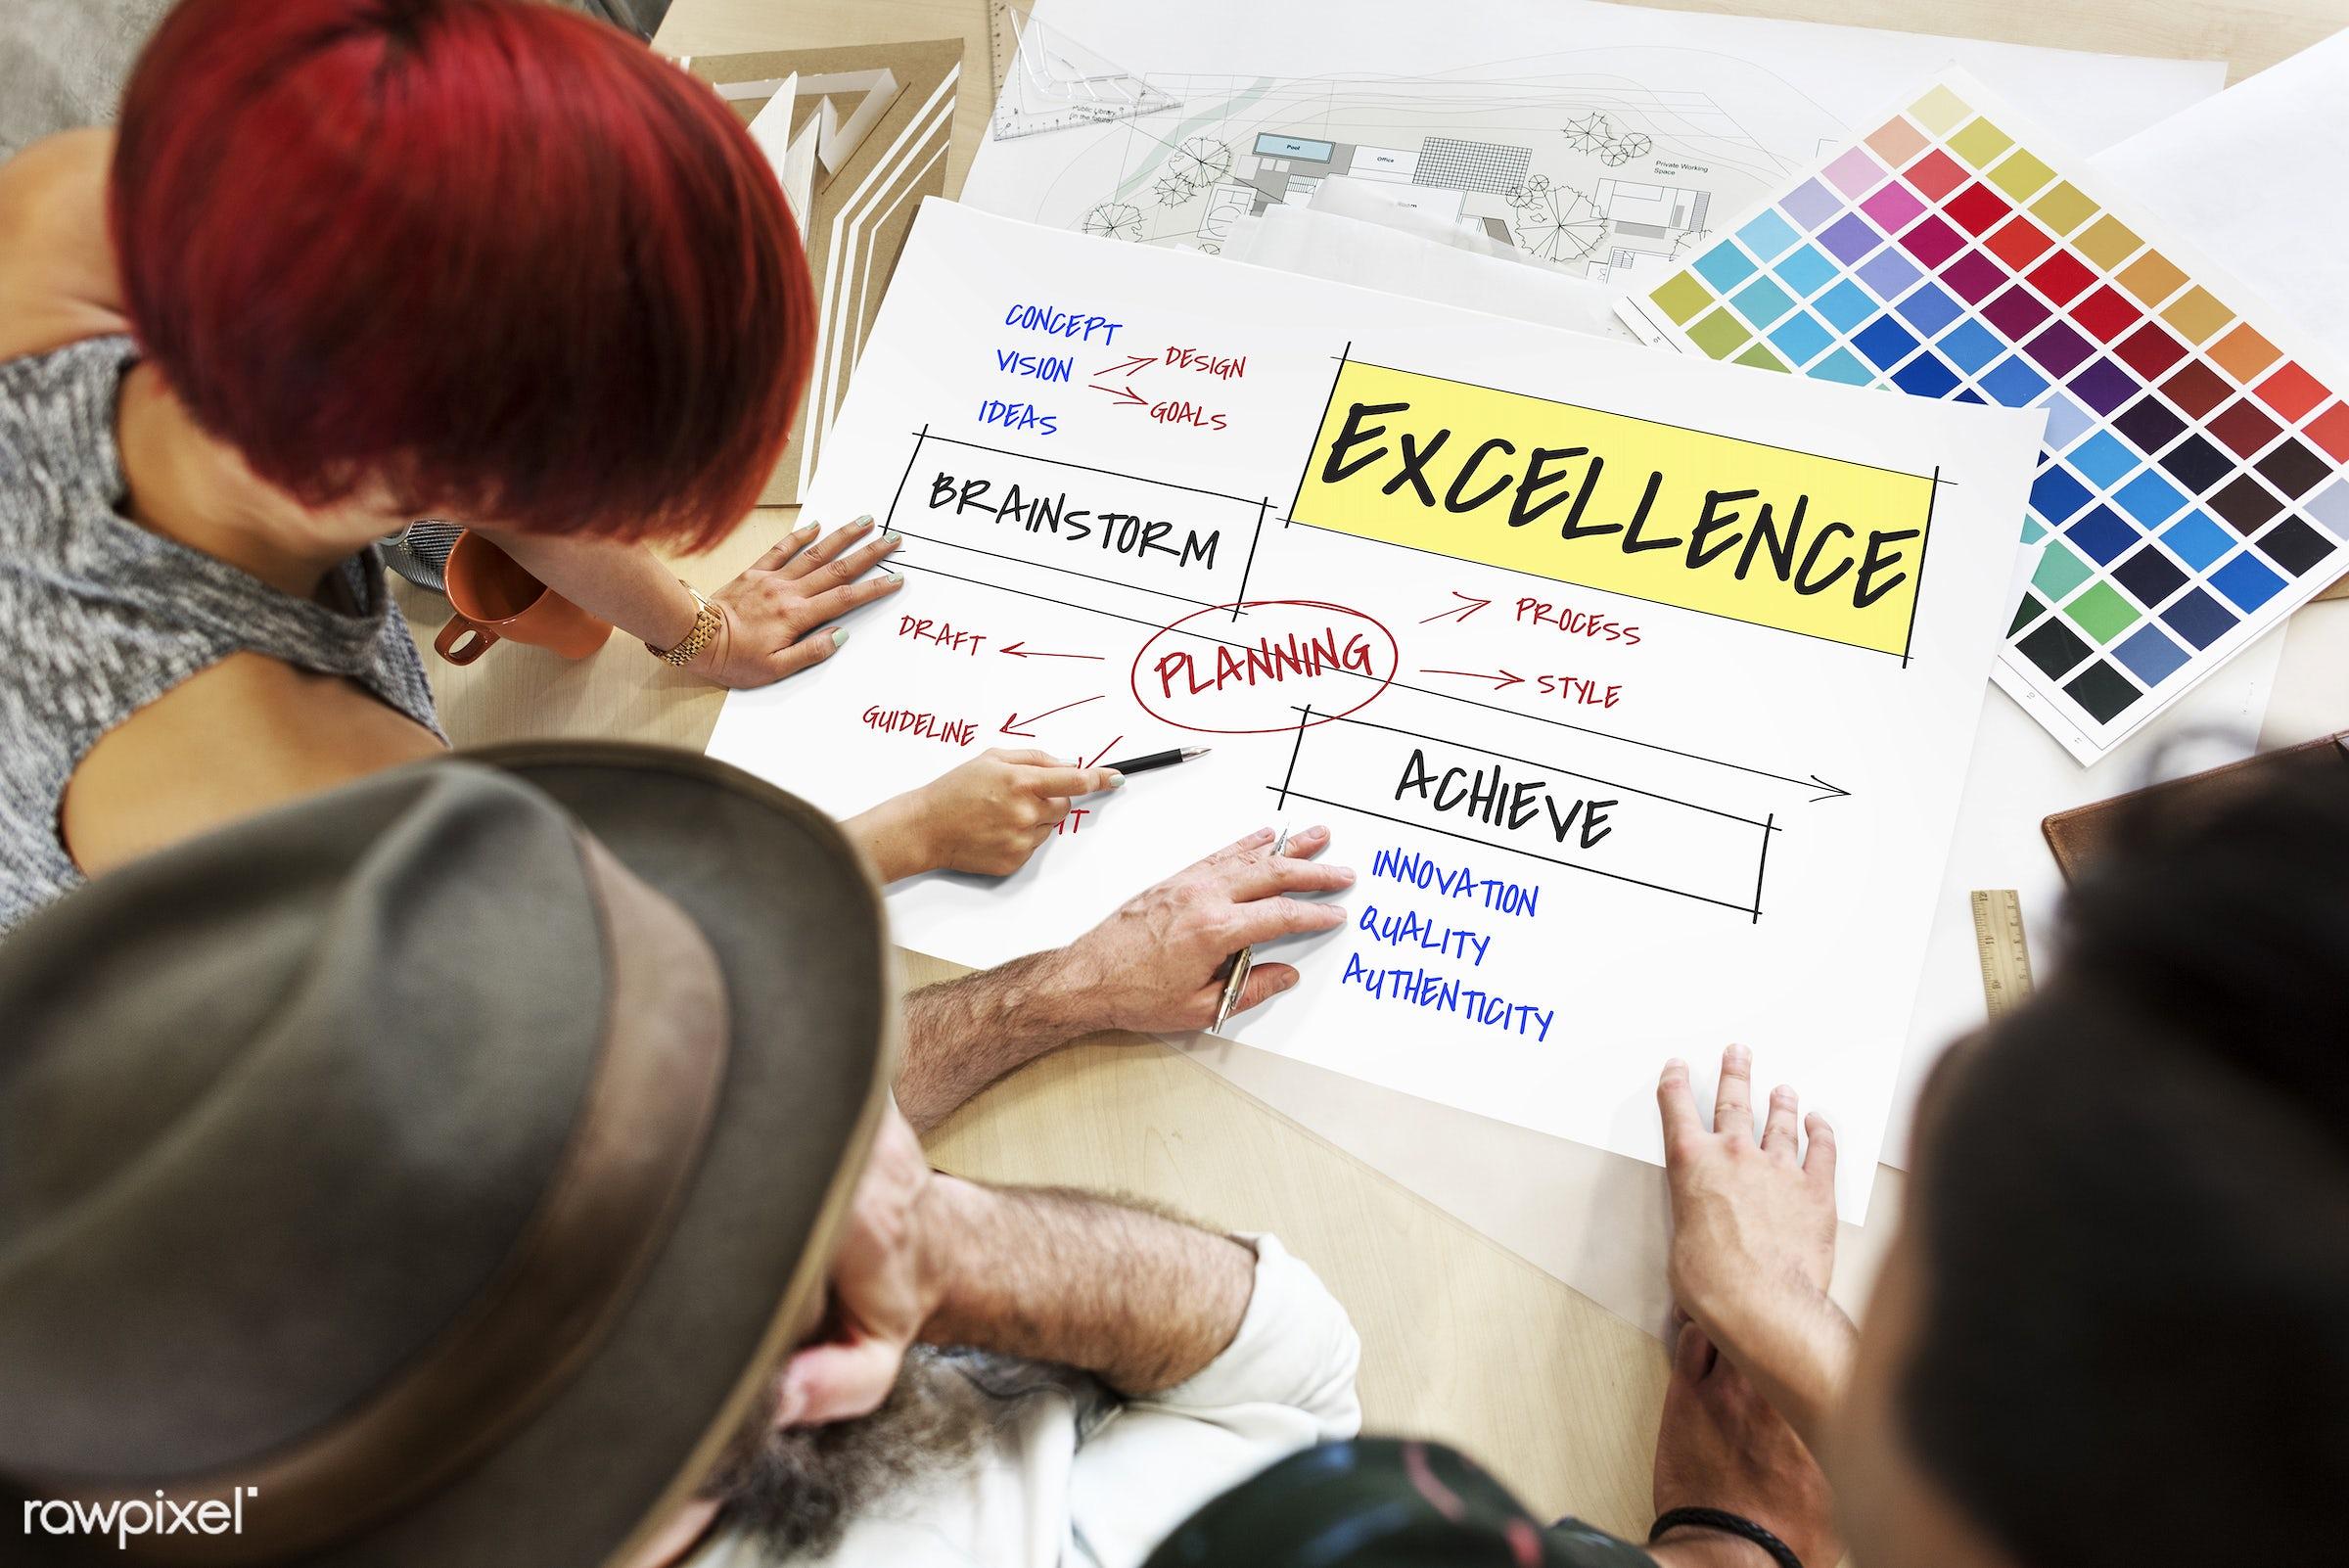 achieve, art, authenticity, be creative, brainstorm, chart, color chart, colors, creative, creativity, design, diagram,...